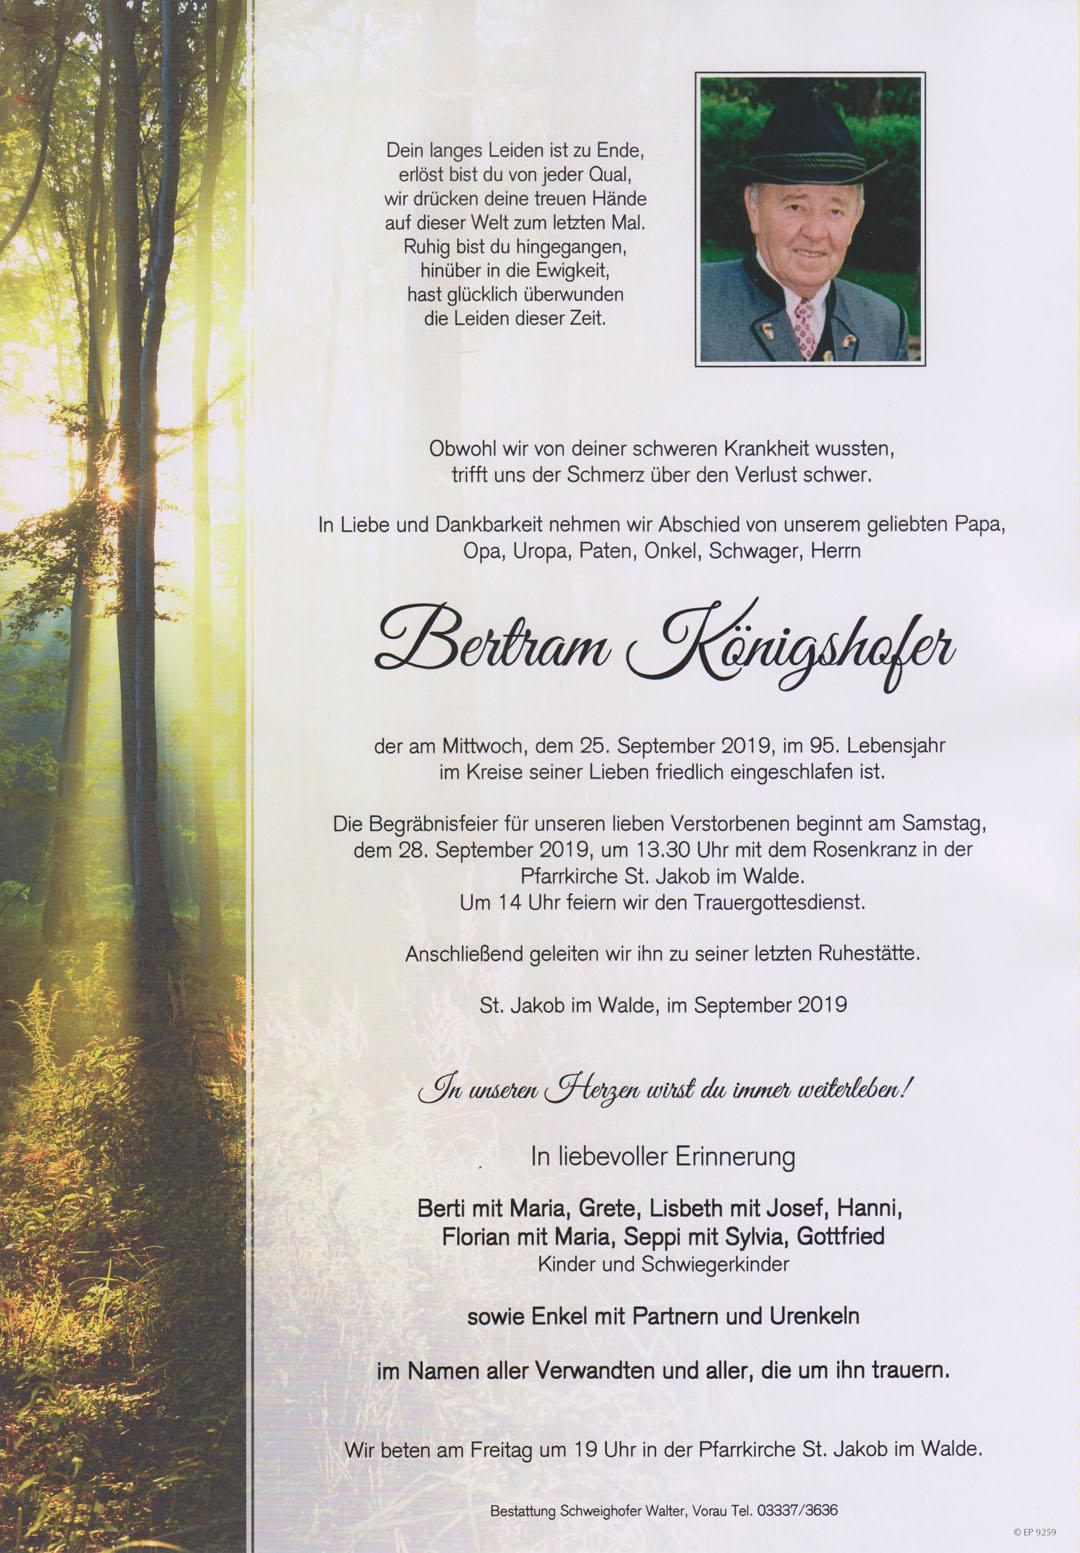 Bertram Königshofer